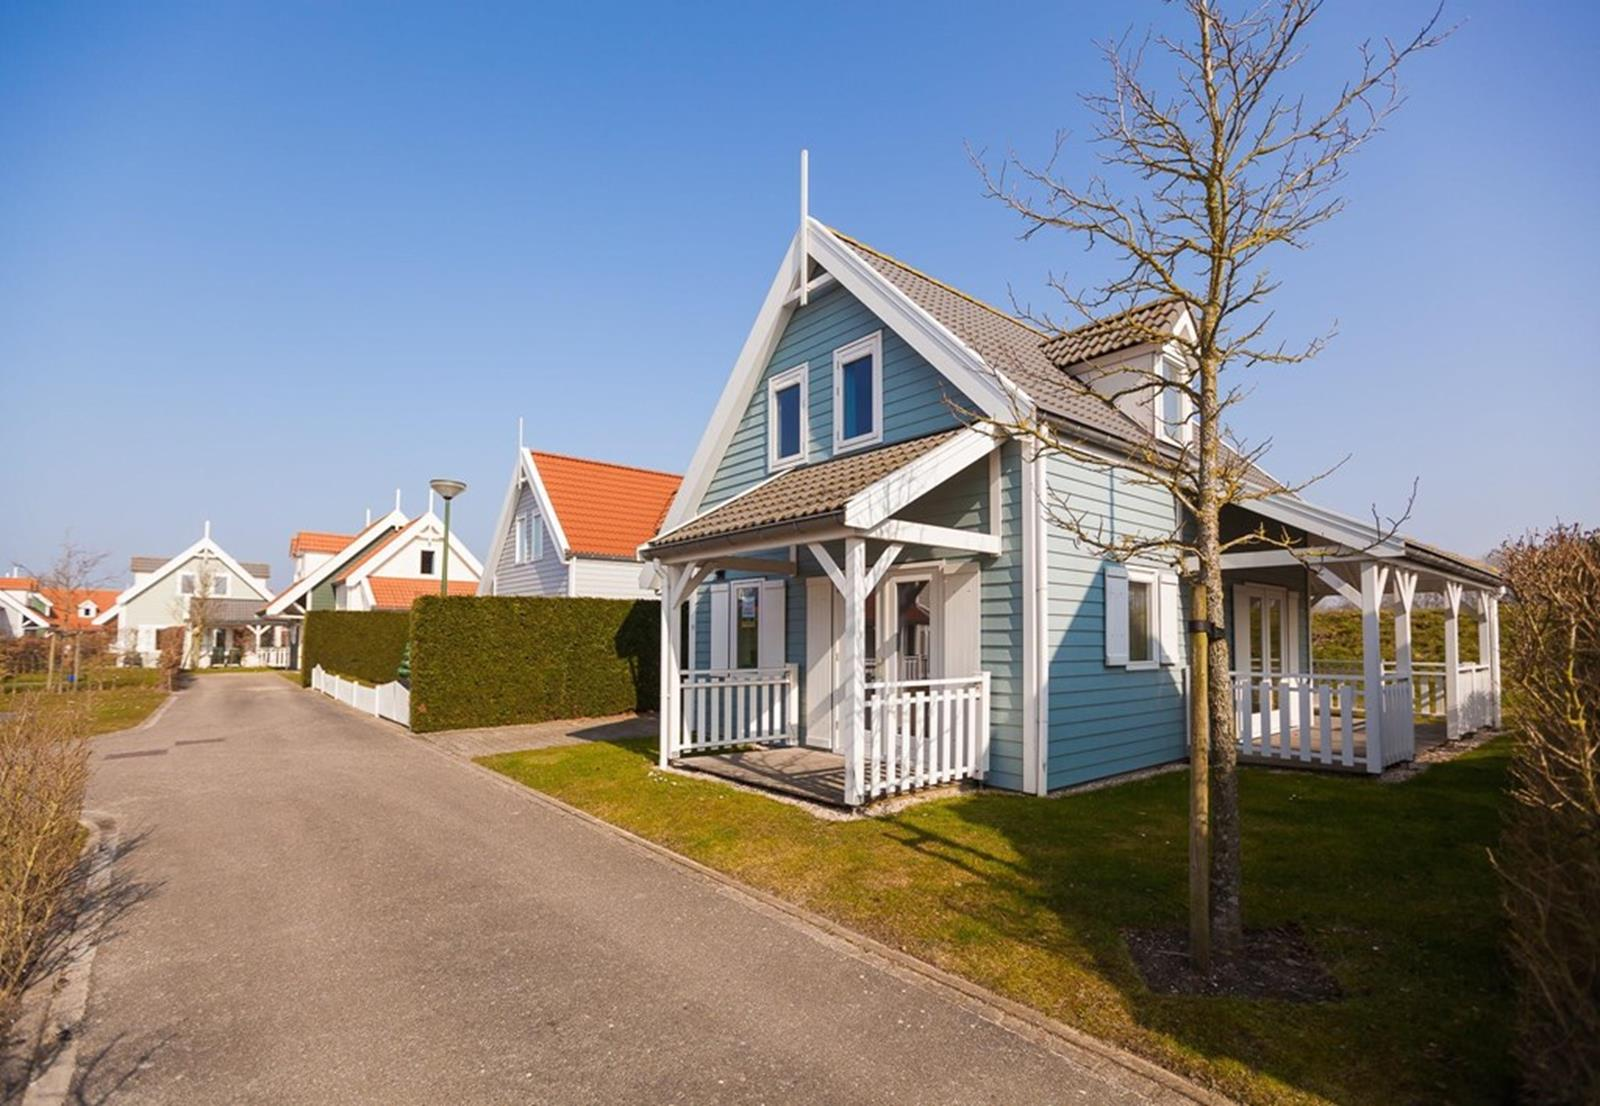 Vakantiehuis te koop Zeeland Bruinisse 002.jpg